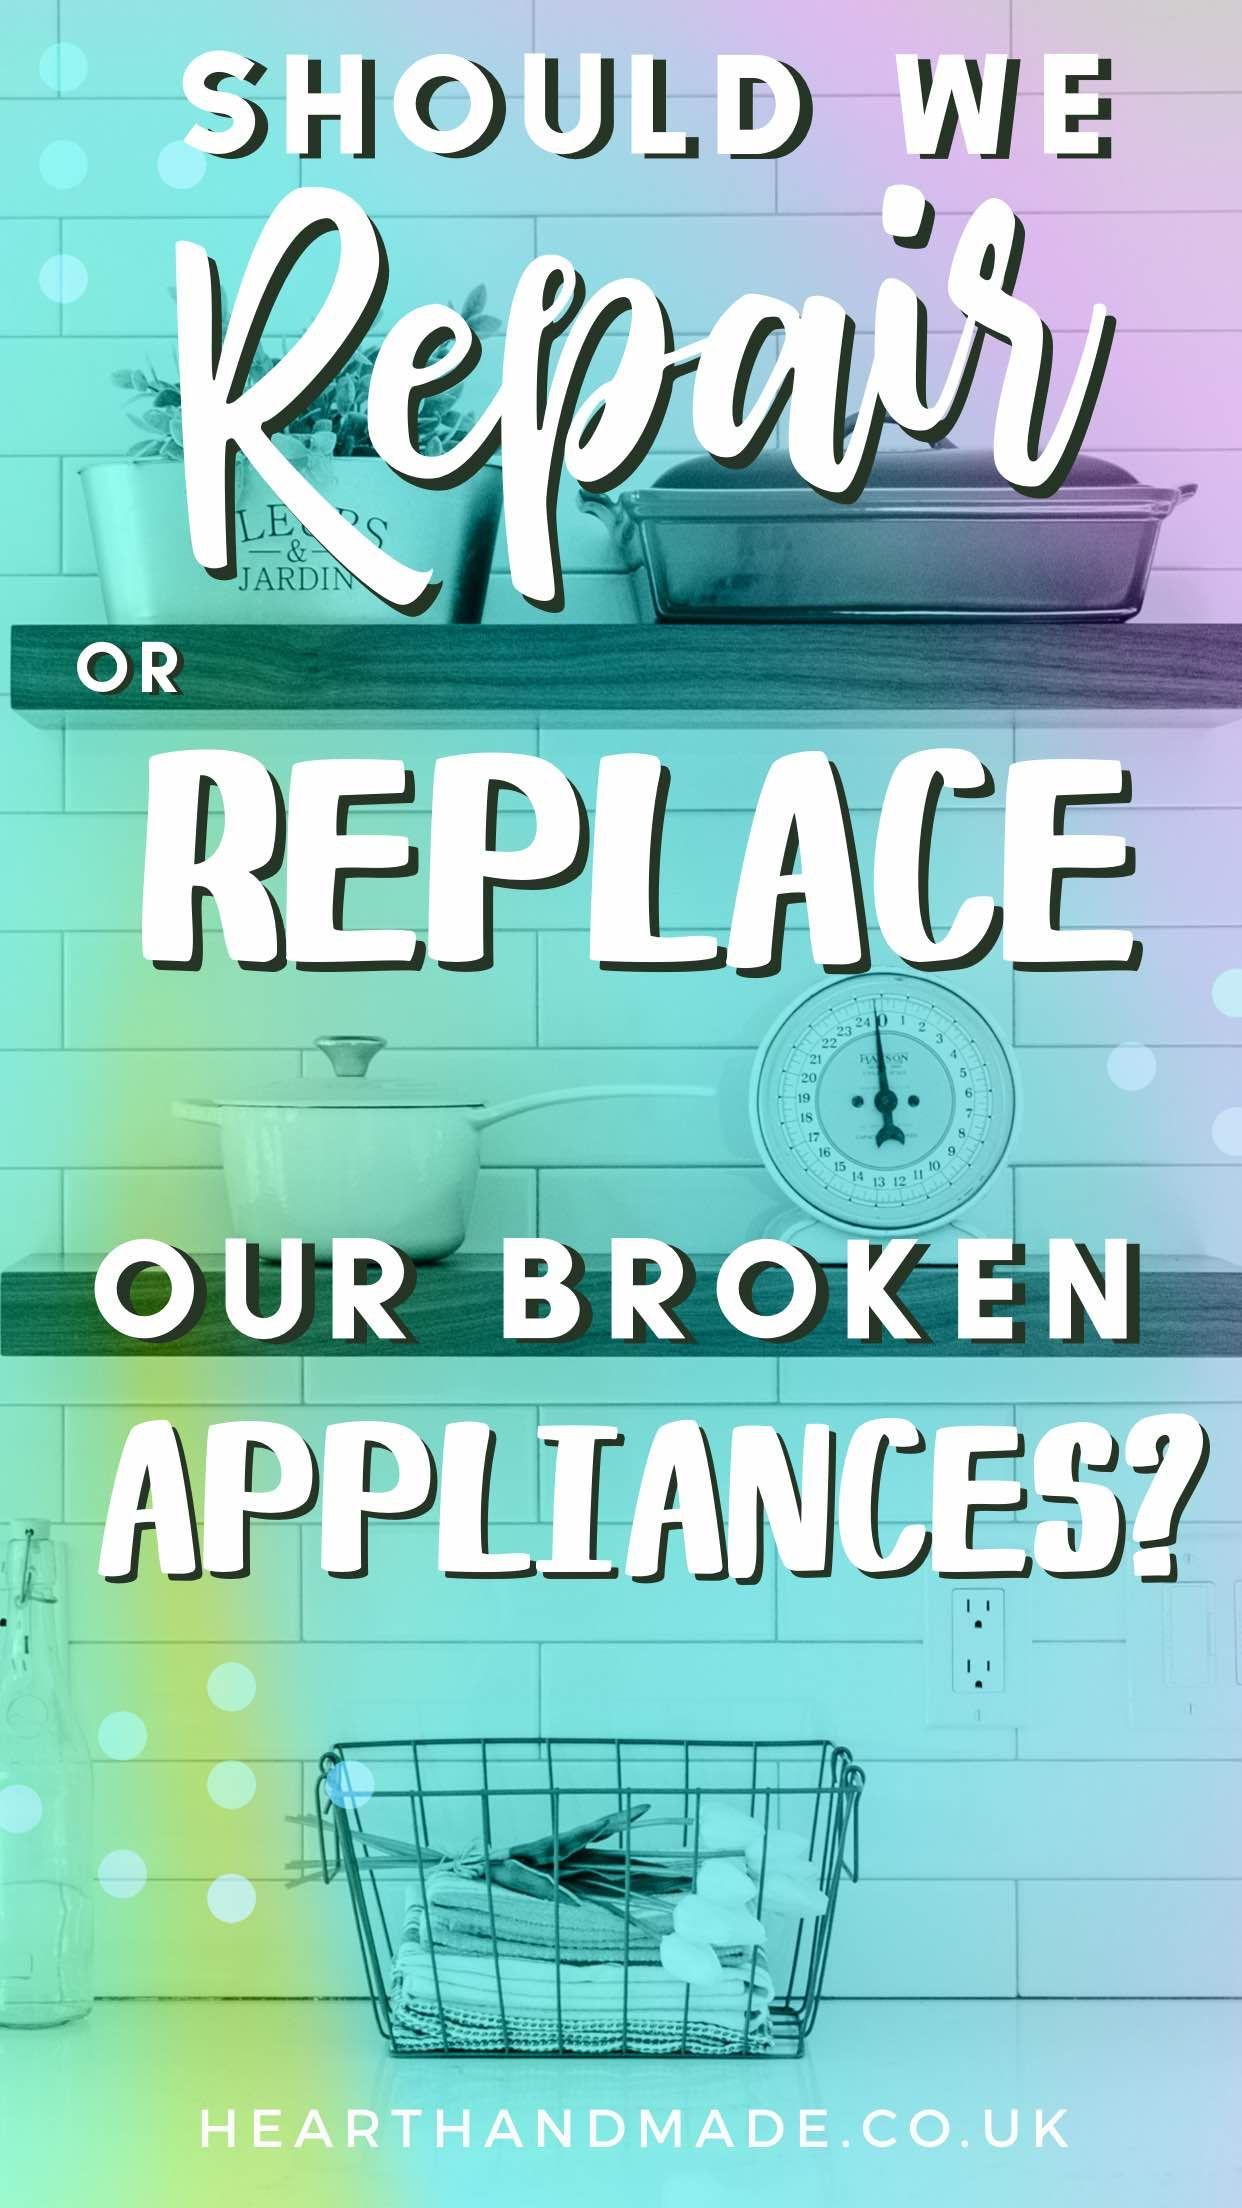 Is Appliance Repair Worth The Money? Appliance repair